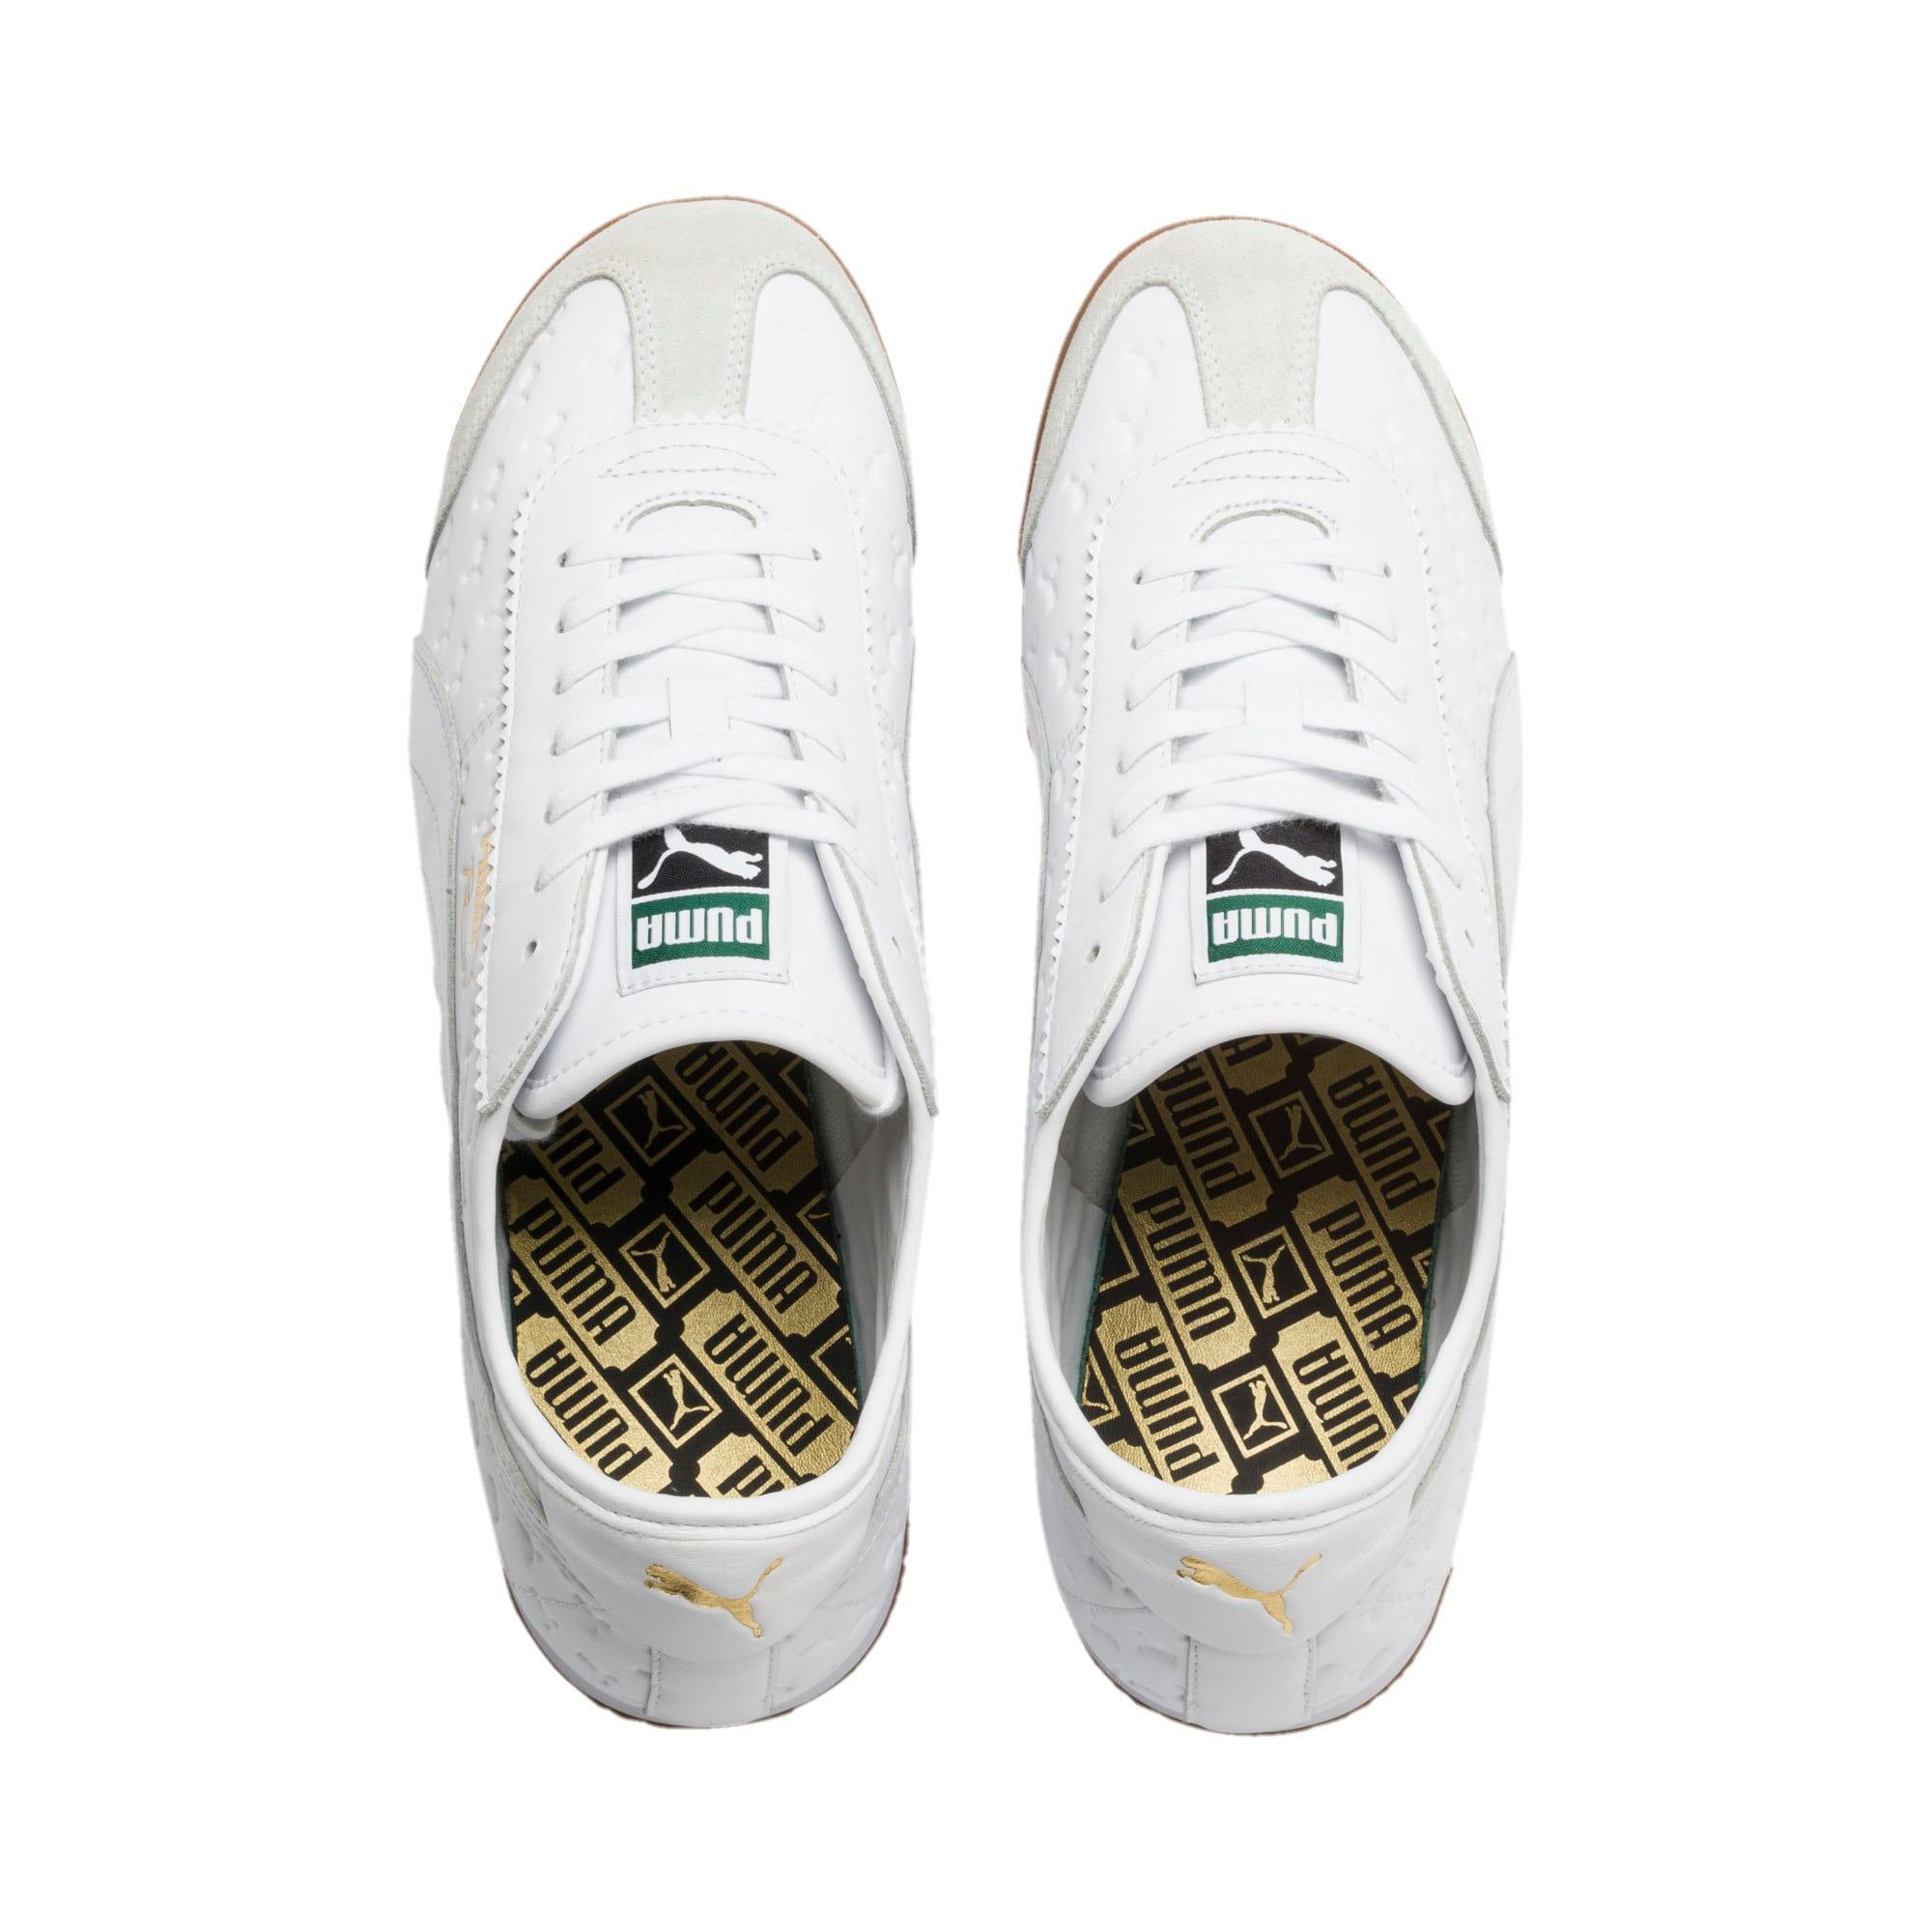 Thumbnail 7 of Roma '68 Gum Sneakers, Puma White-Puma White, medium